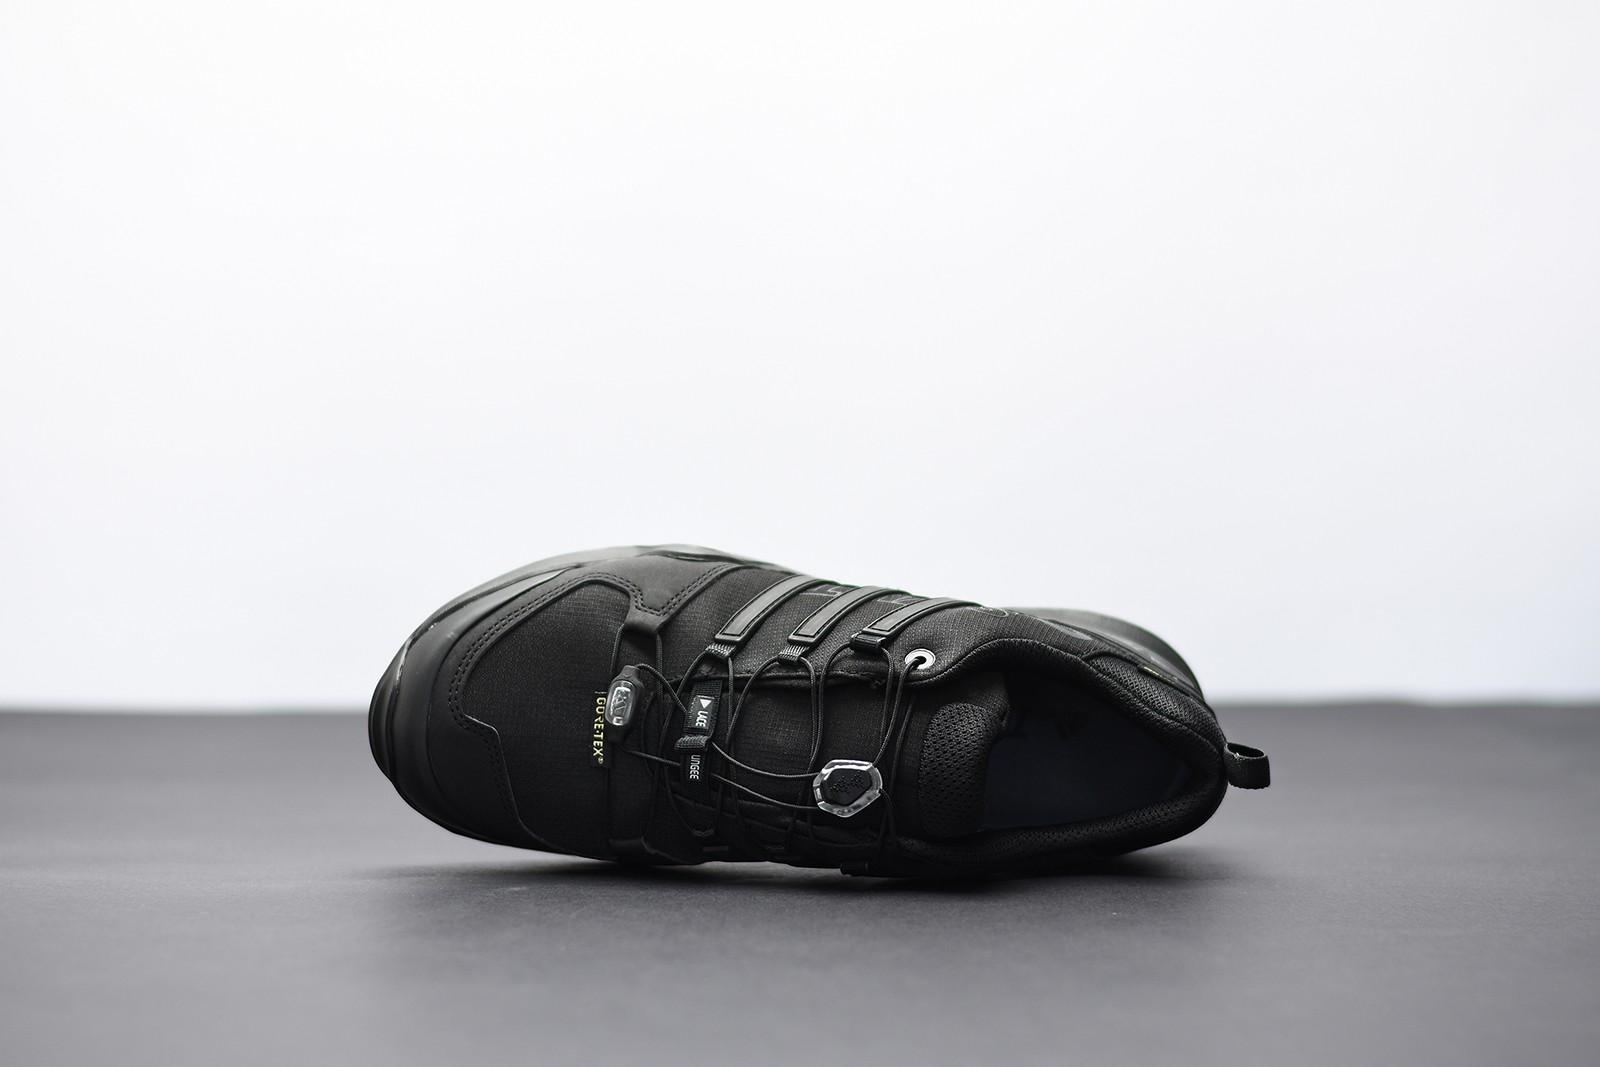 c42c3e9a6a1 Pánská treková obuv adidas Performance TERREX SWIFT R2 GTX